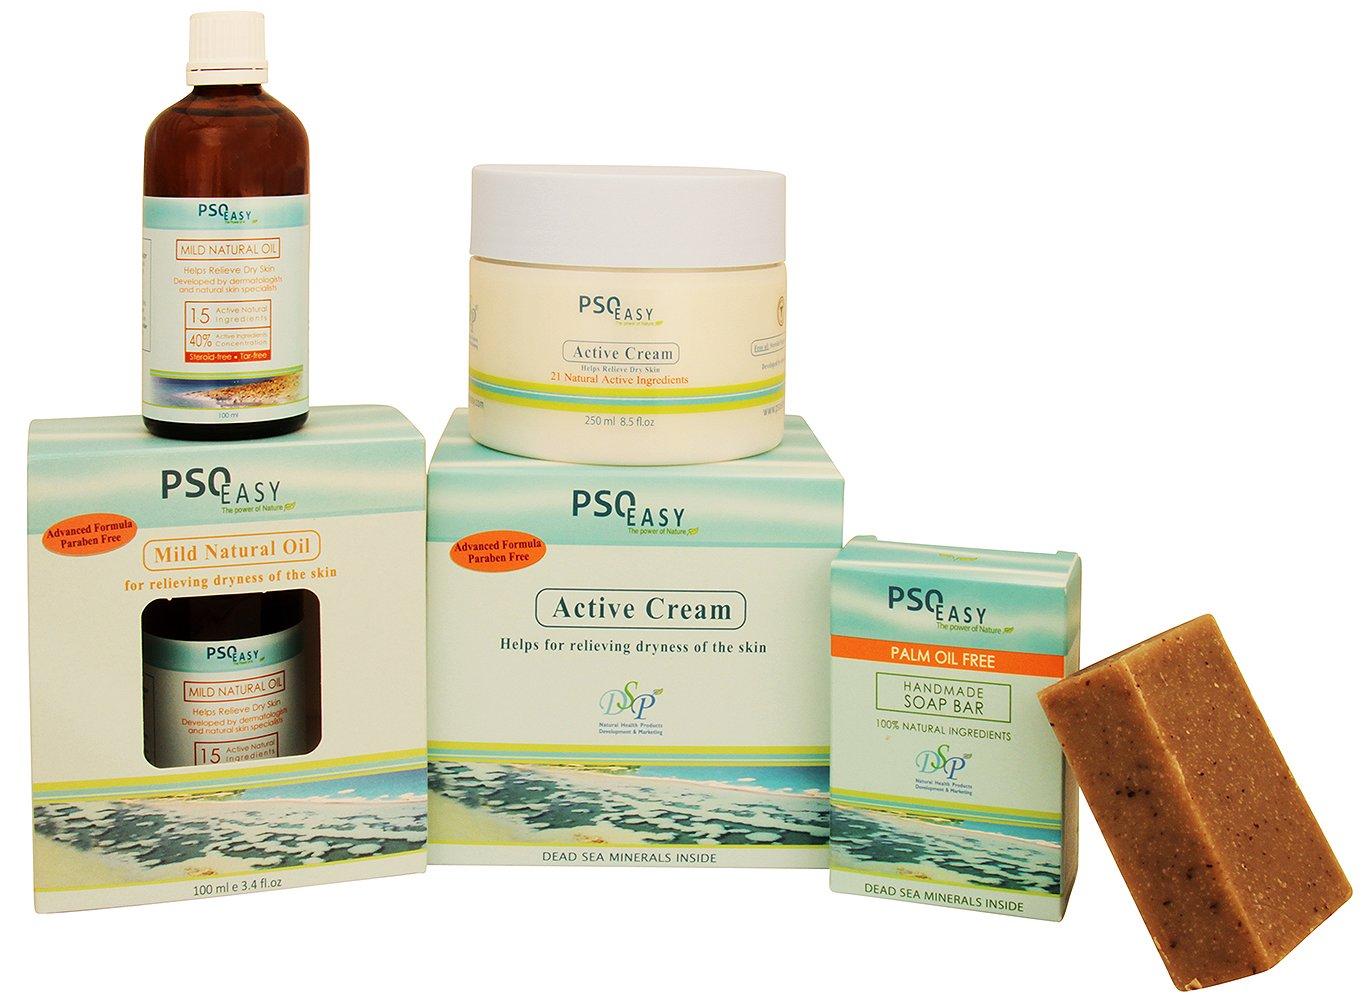 PSOEasy Psorasis Treatment Kit - Psoriasis Cream 250 ml - Mild Natural Oil - Psoriasis Soap - Contains Dead Sea minerals